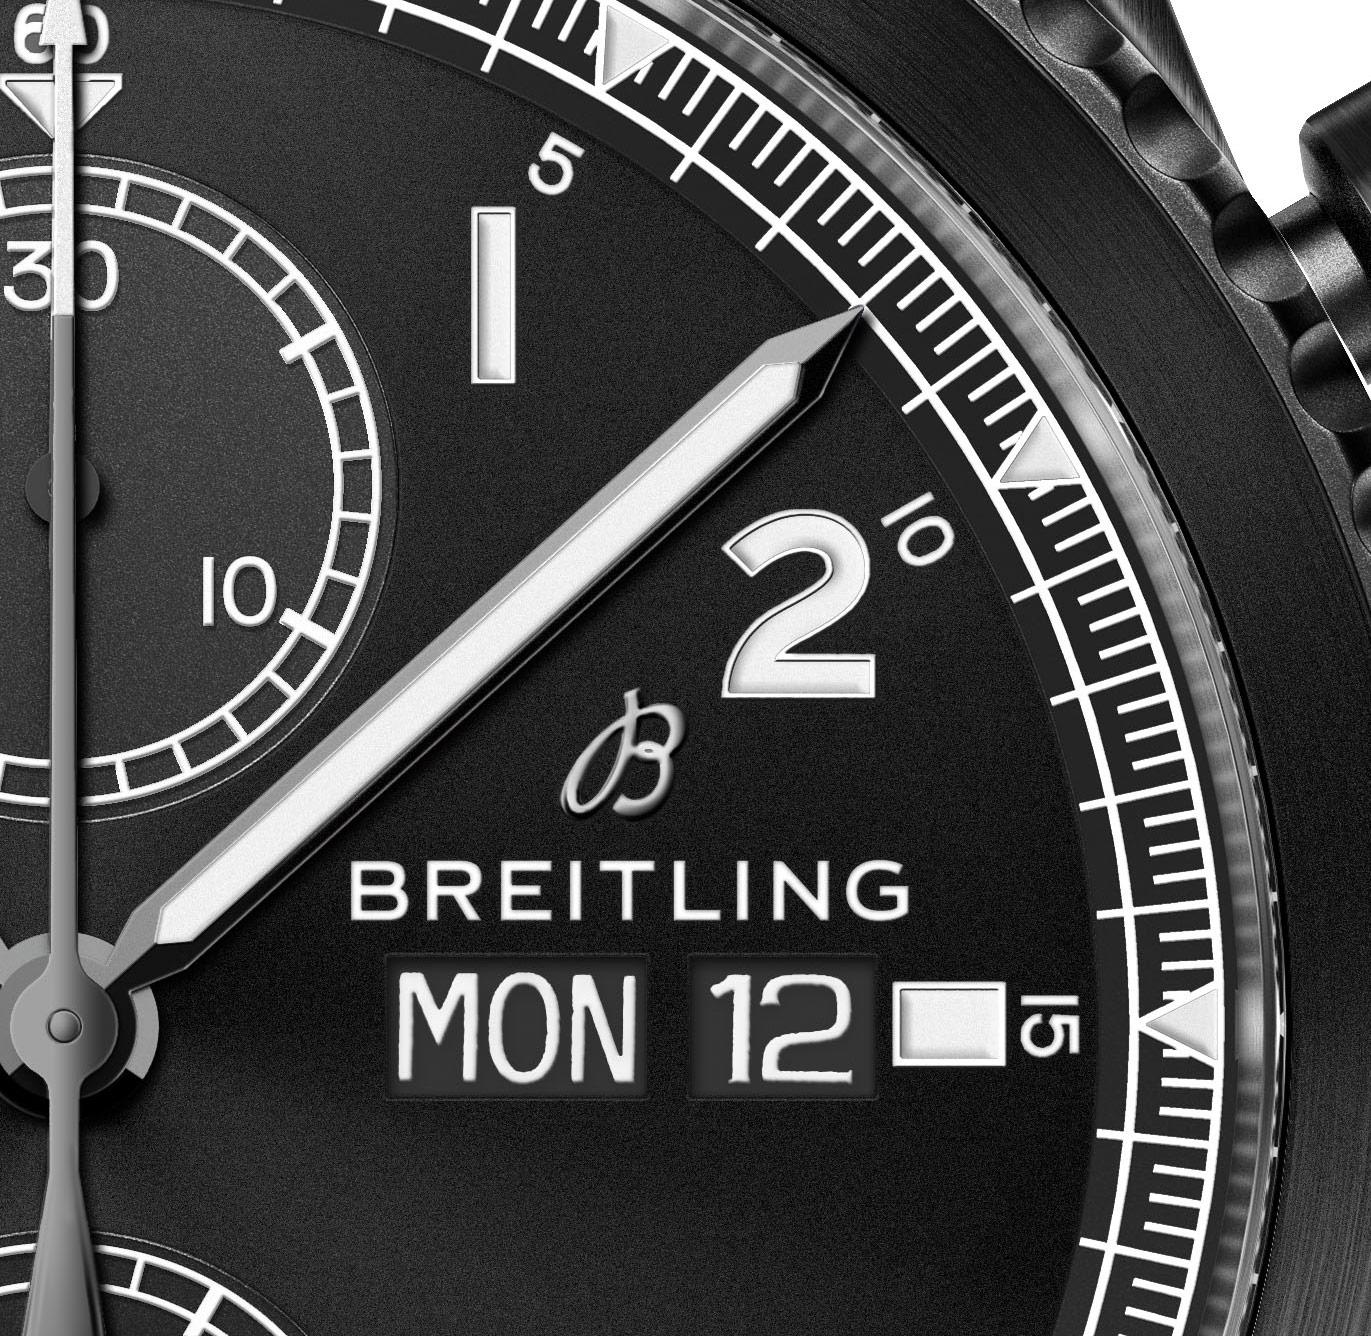 Breitling Navitimer 8 Chronograph dial